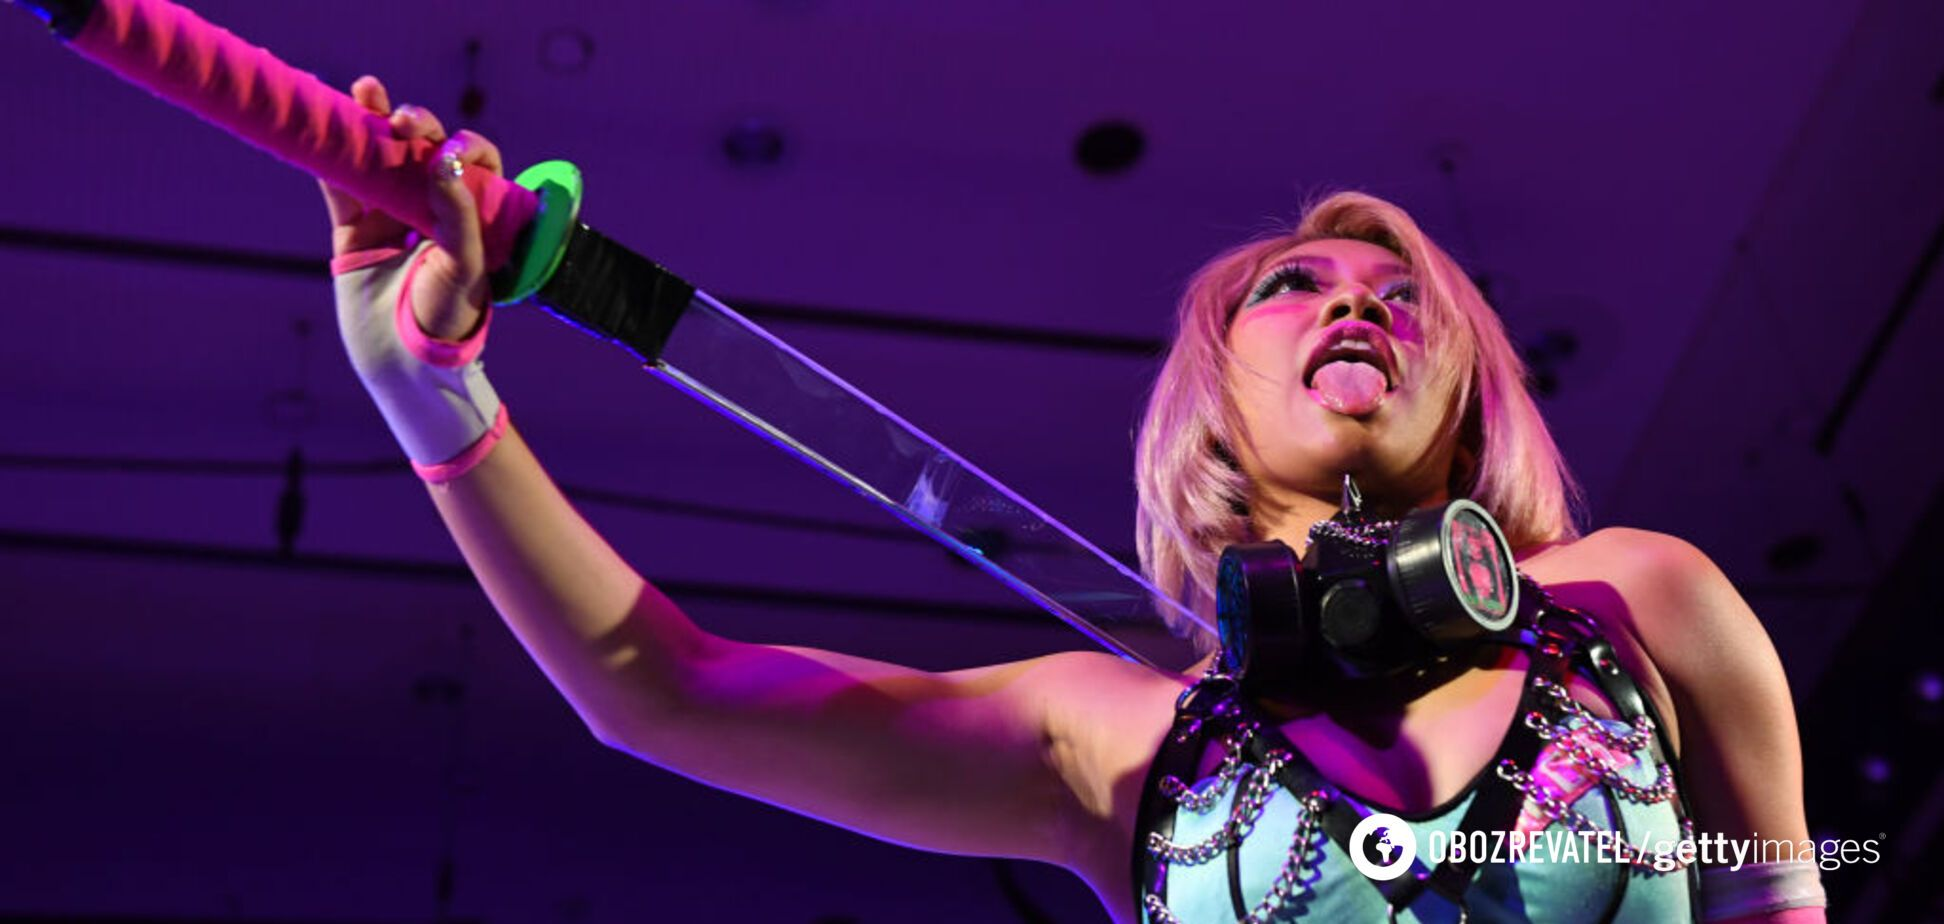 Спортсменка-звезда шоу на Netflix Хана Кимура внезапно умерла в 22 года